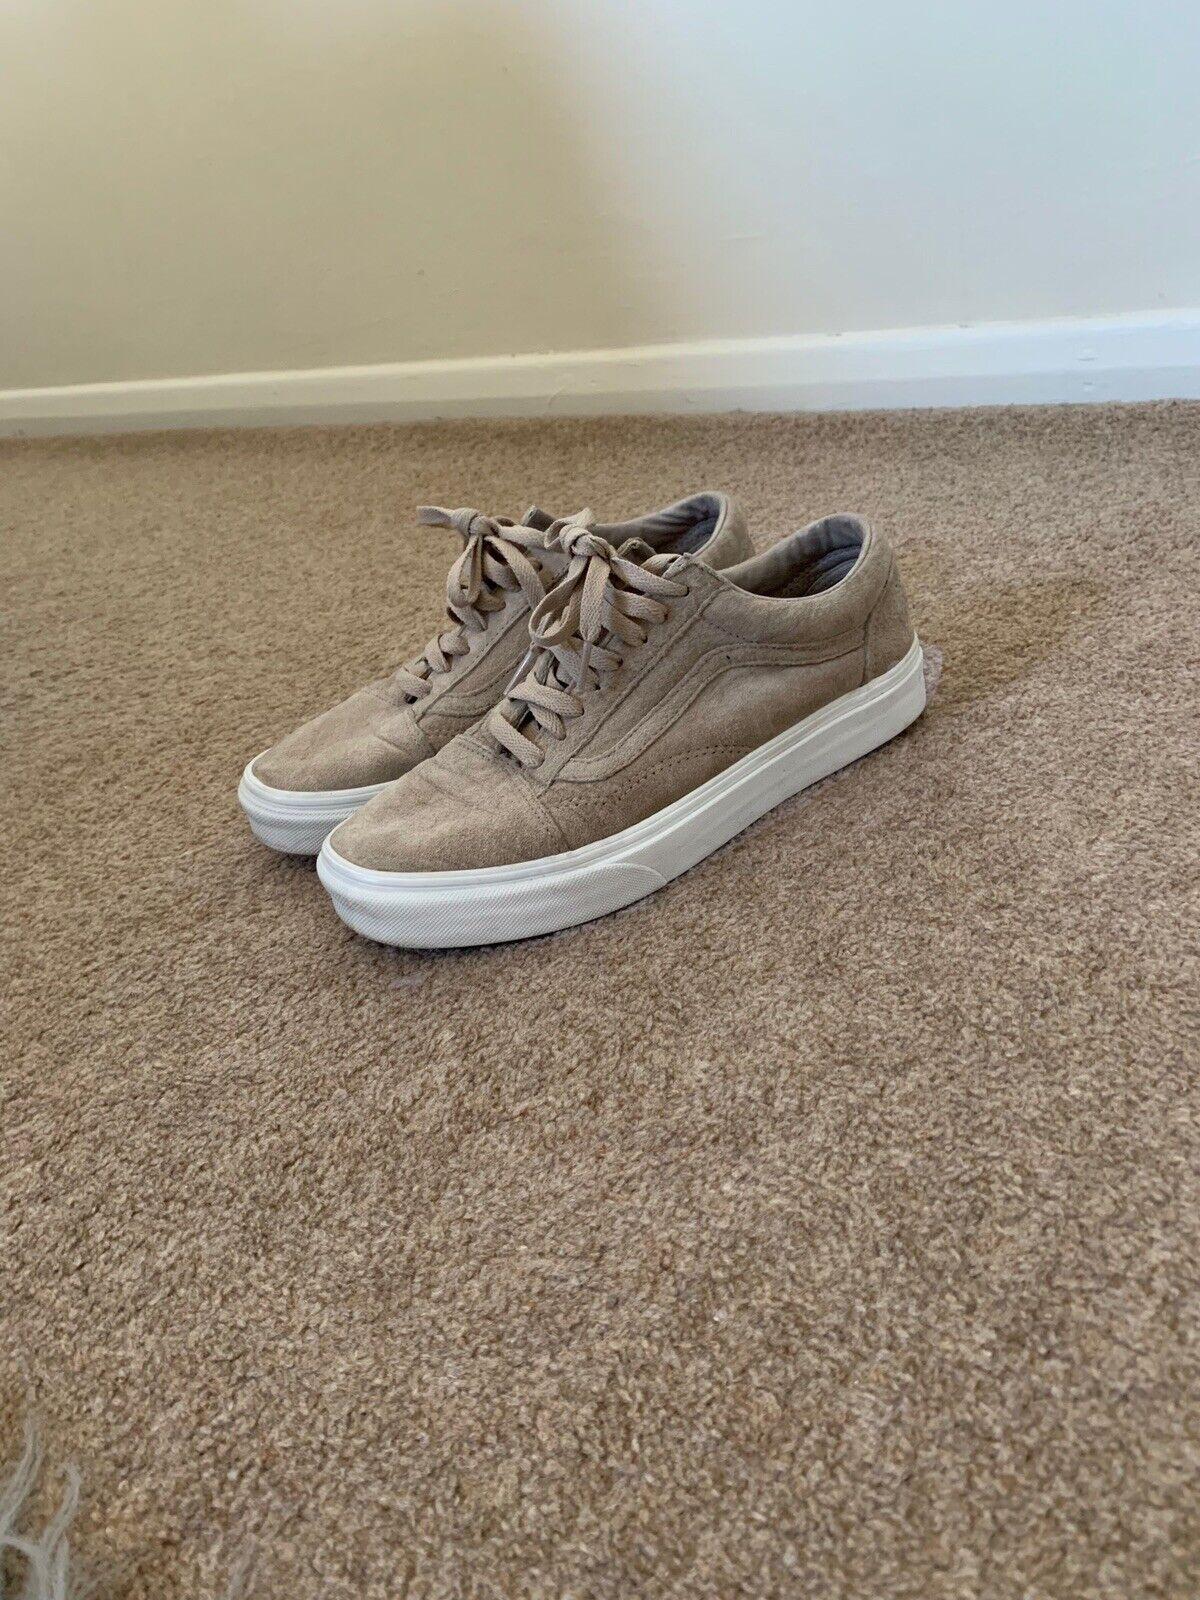 648cc56fdfc Old skool vans size 6.5 nrohrh5375-Athletic Shoes